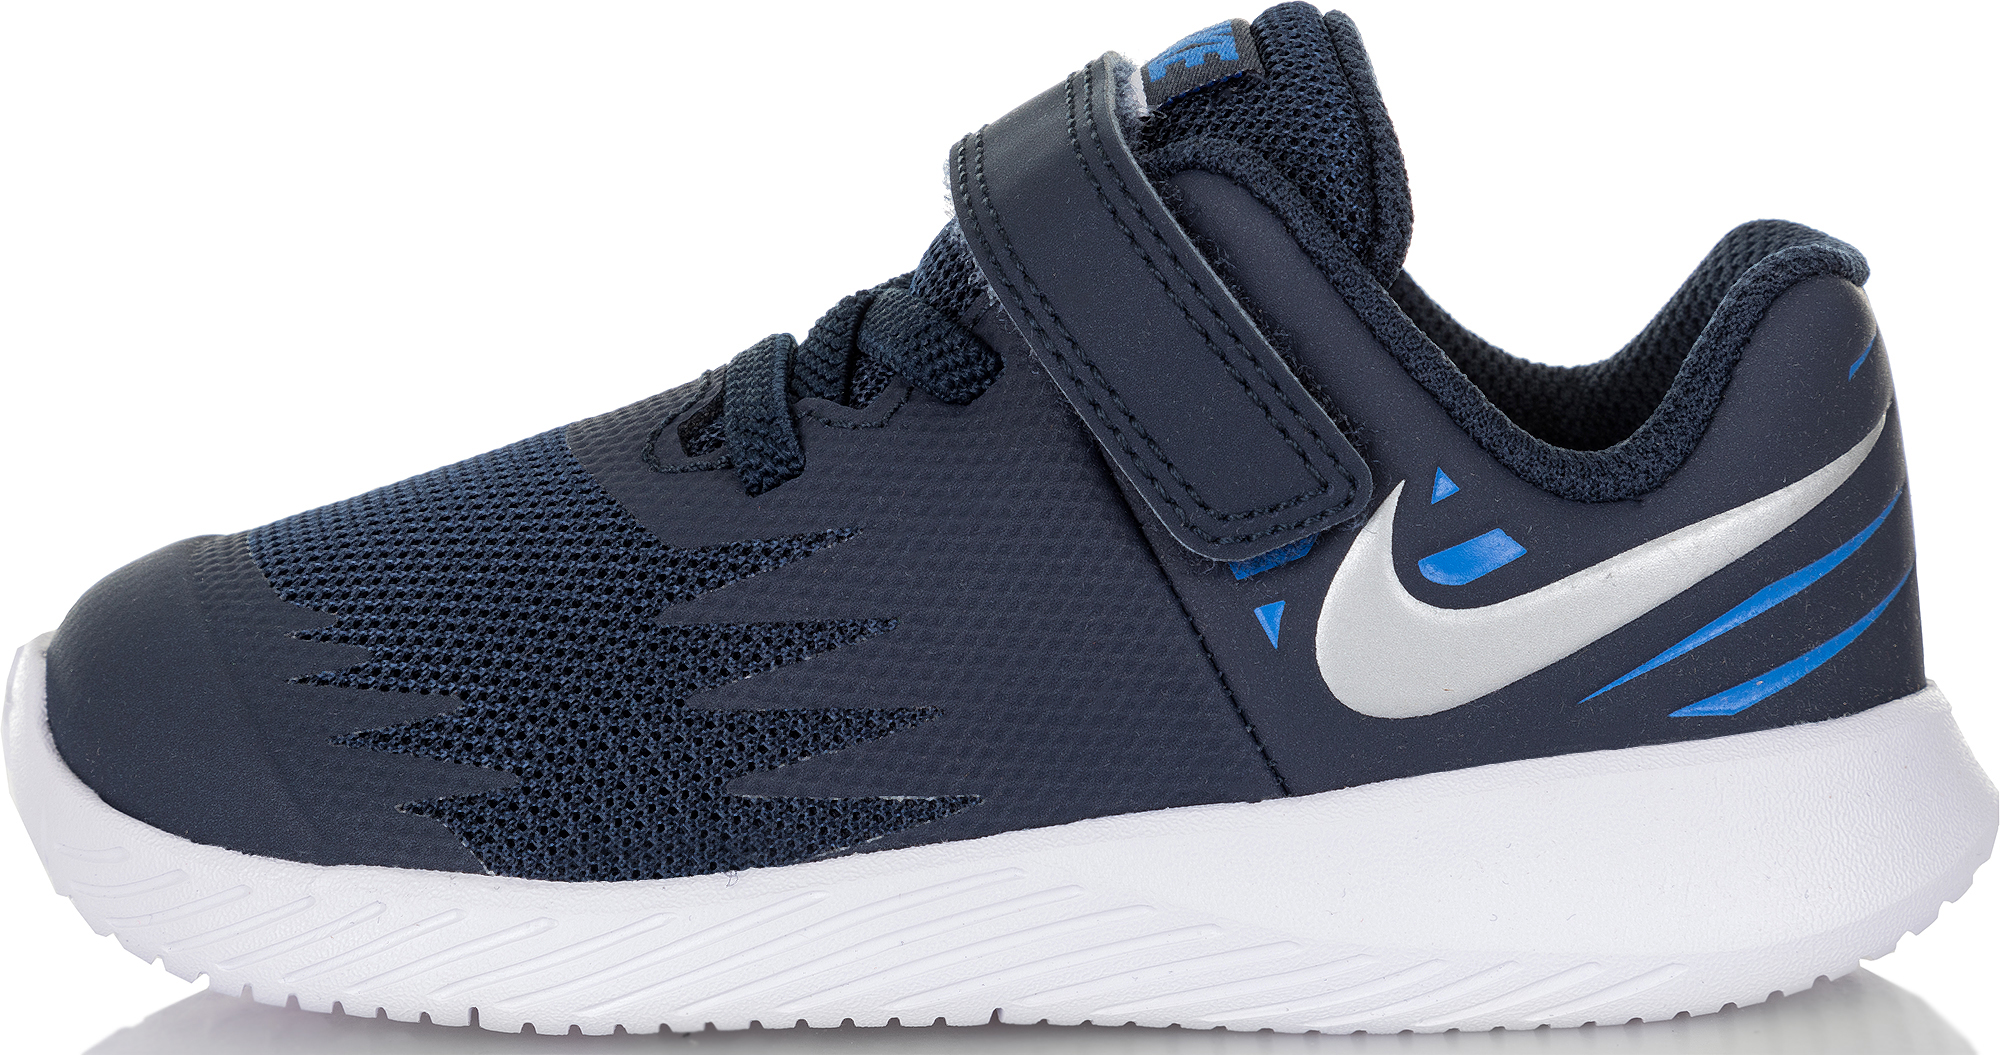 Nike Кроссовки для мальчиков Nike Star Runner, размер 26 taming the star runner